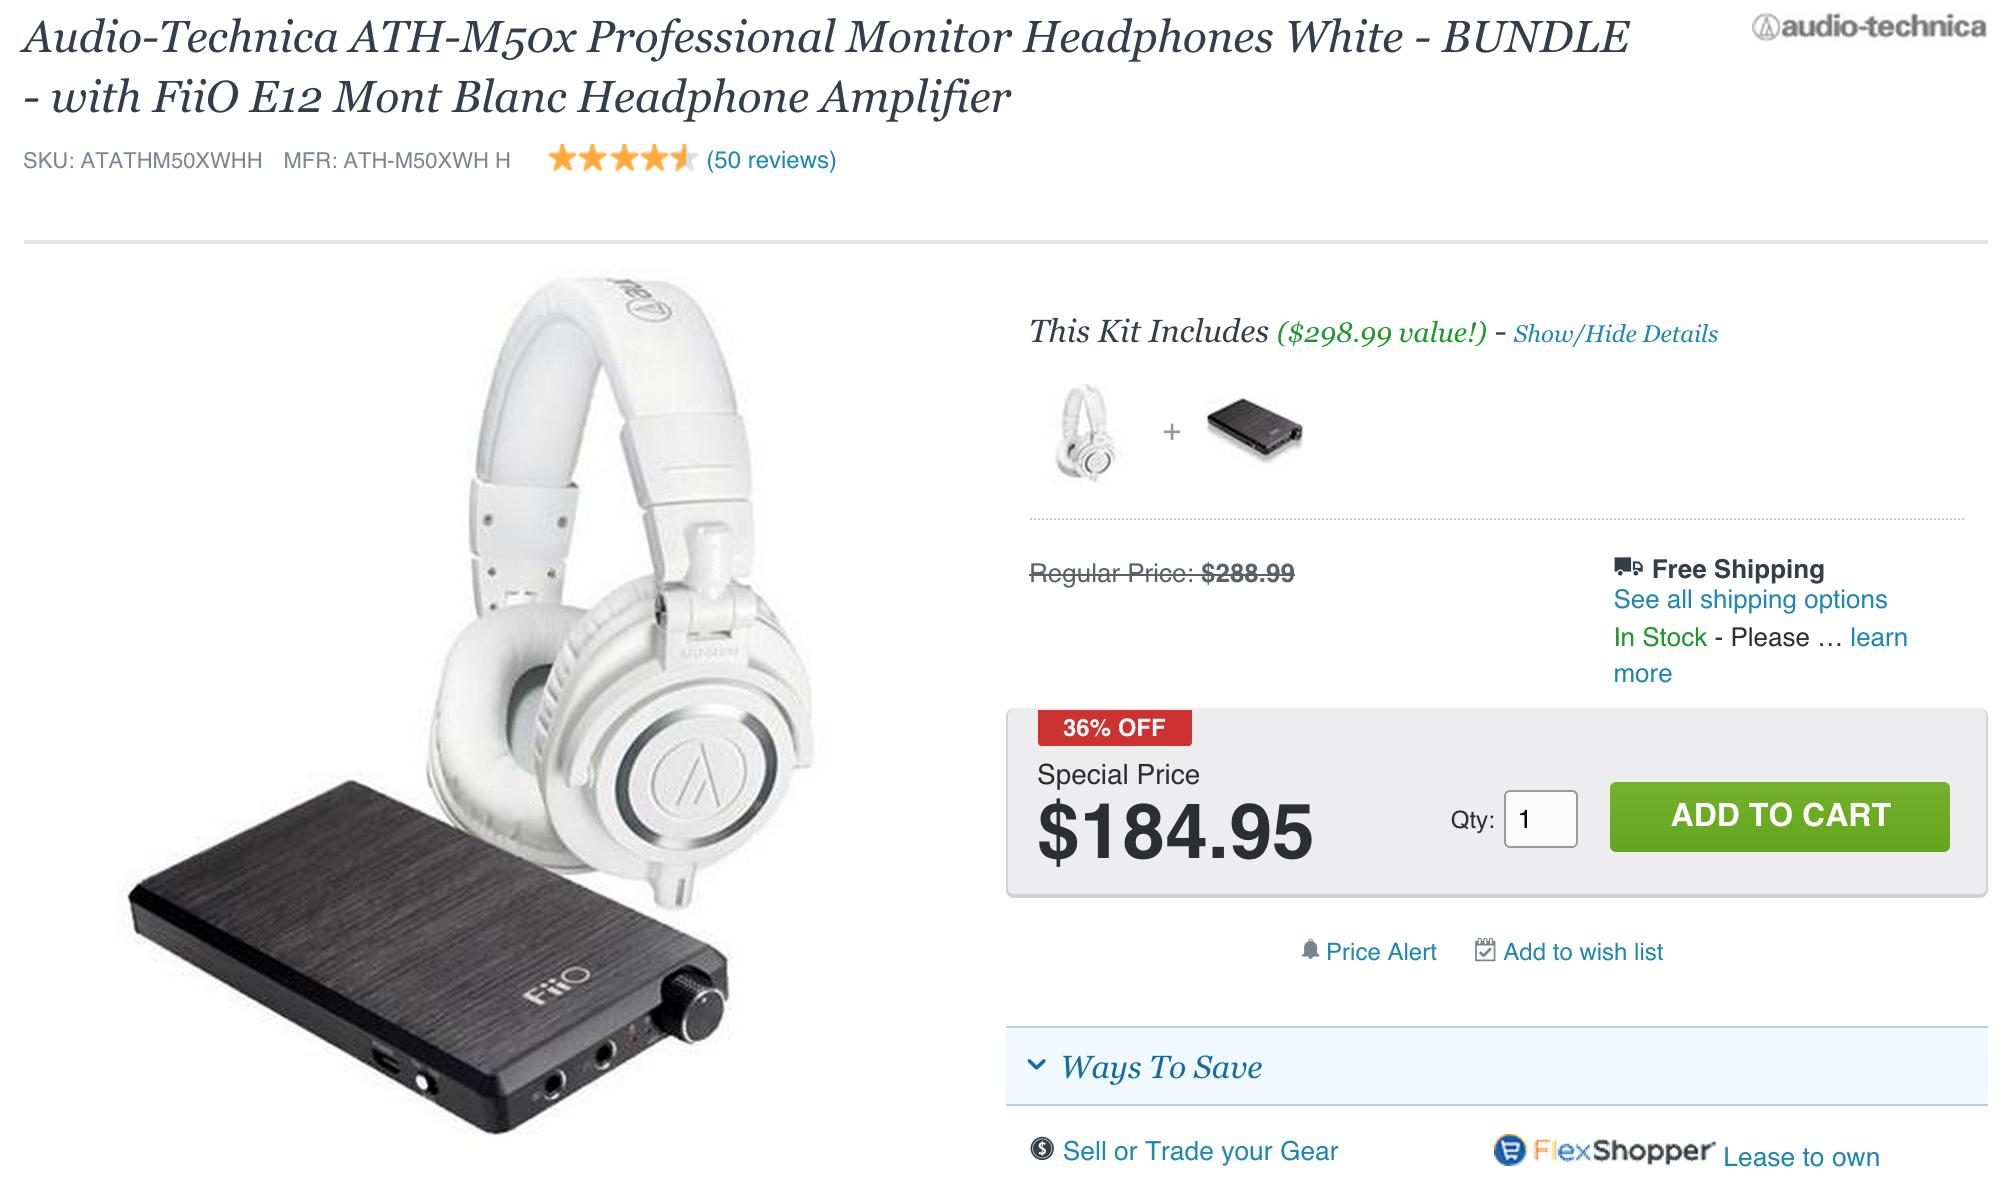 audio-technica-fiio-deal